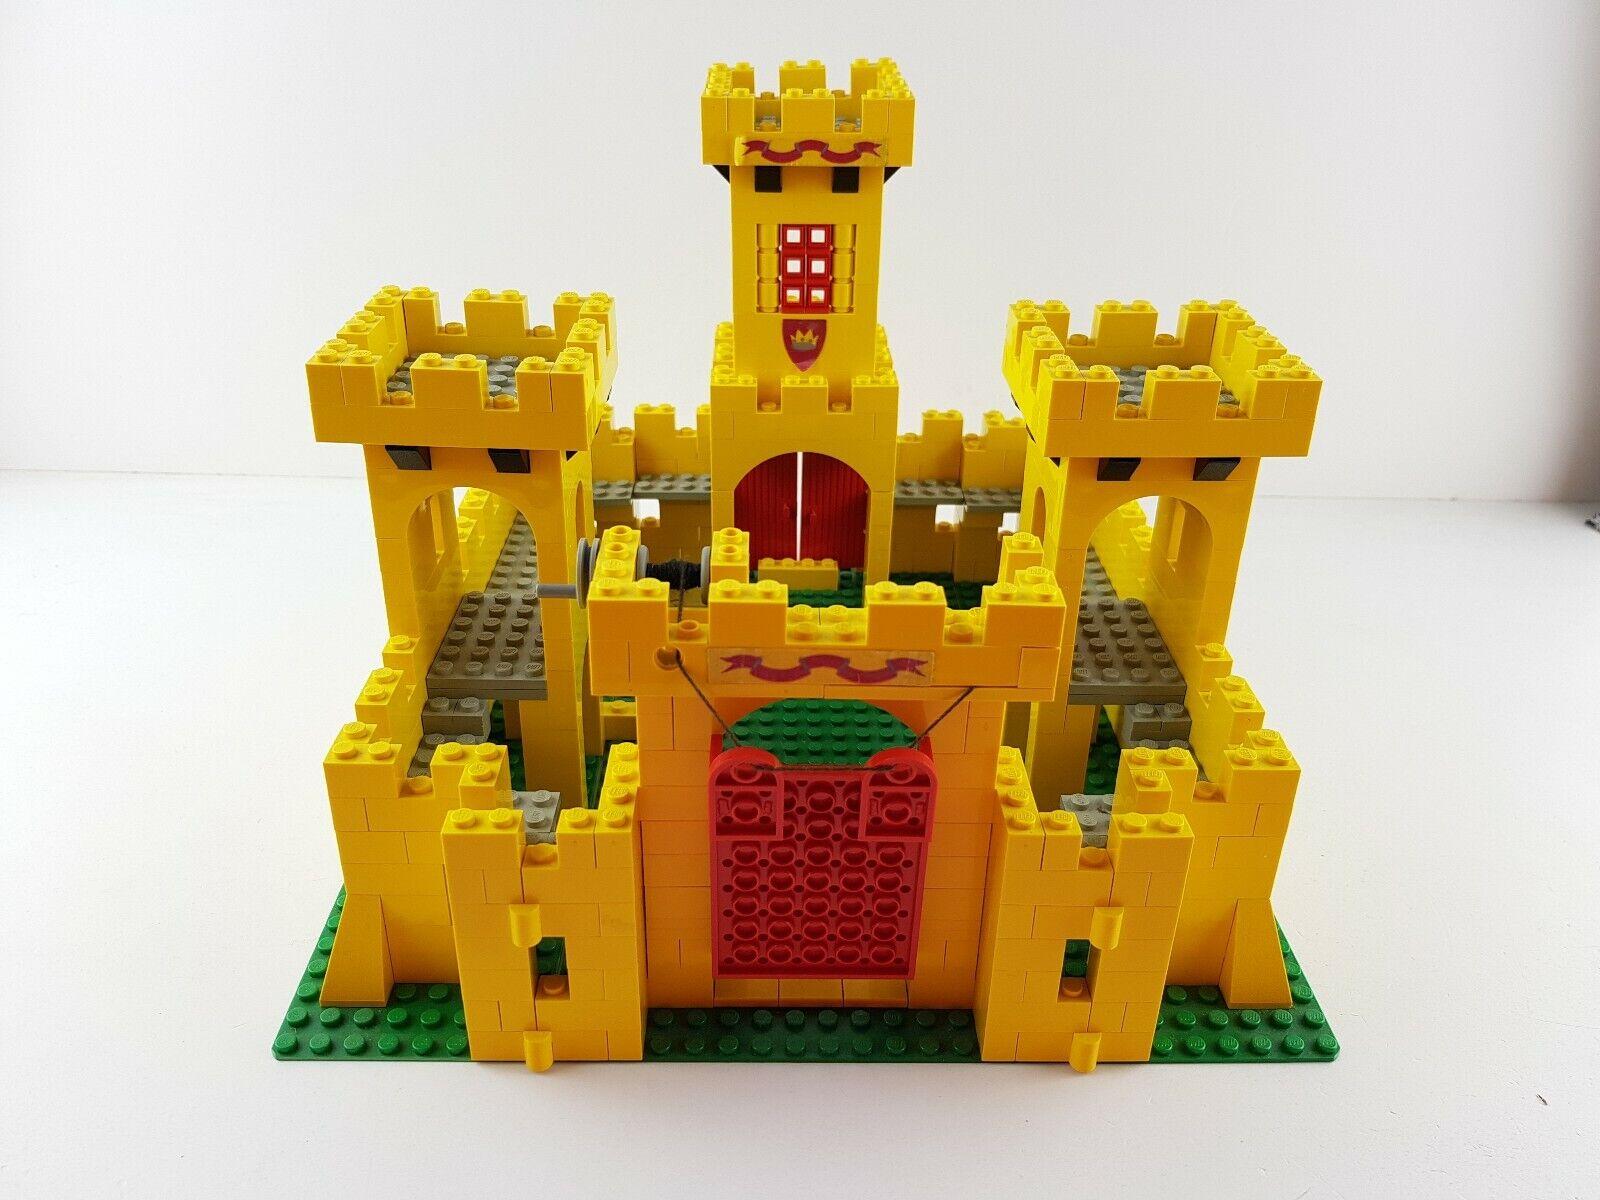 Lego® Ritter Burg 375 Castle Classic unvollständig Ritterburg gelb yellob